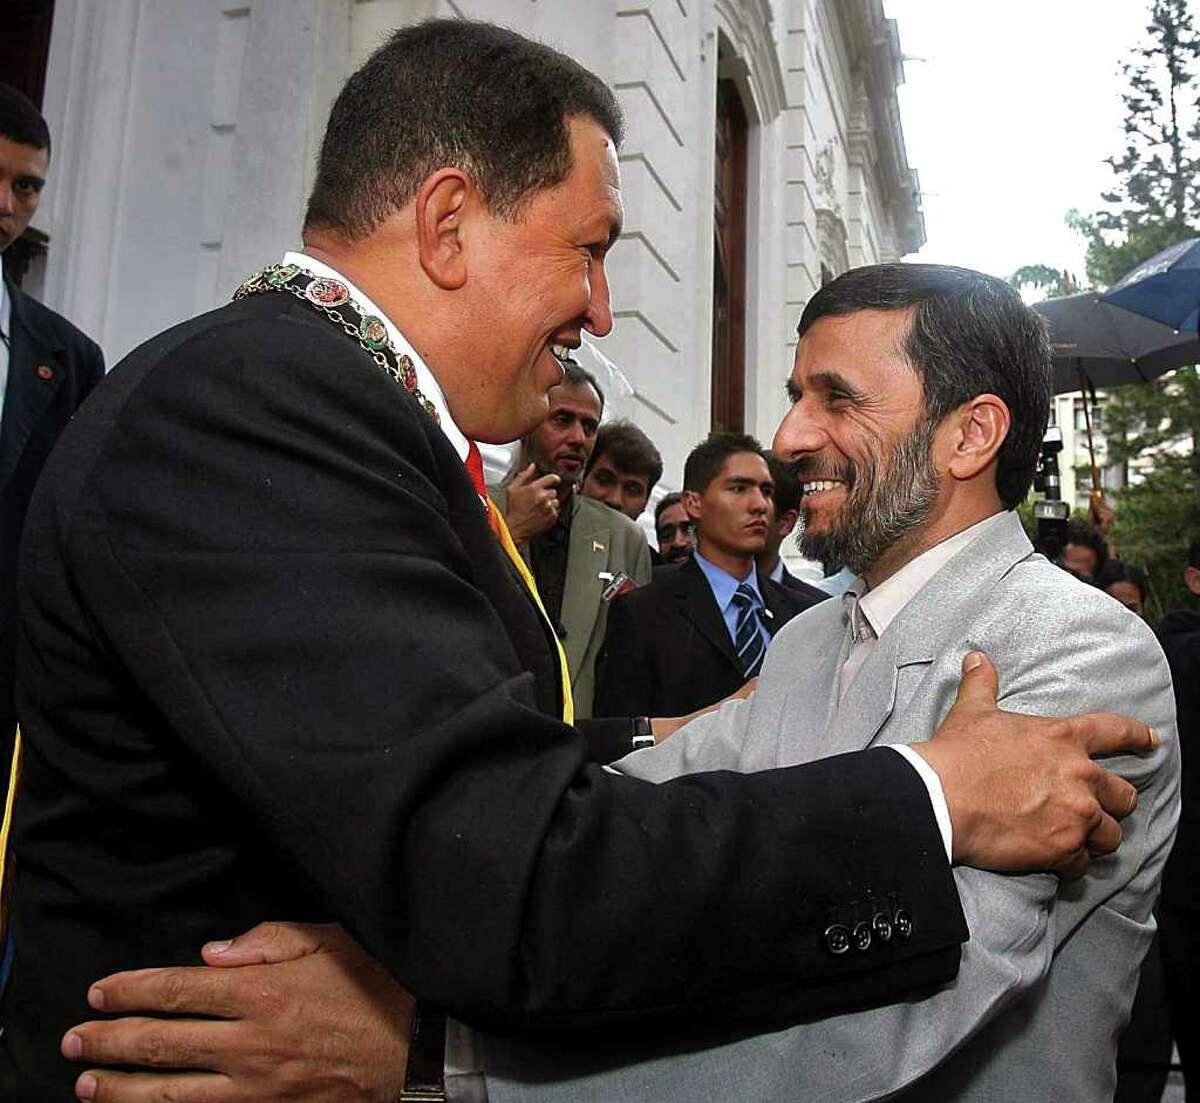 LATIN TIES: Iran's Mahmoud Ahmadinejad with Bolivia's Evo Morales, Venezuela's Hugo Chavez and Nicaragua's Daniel Ortega.